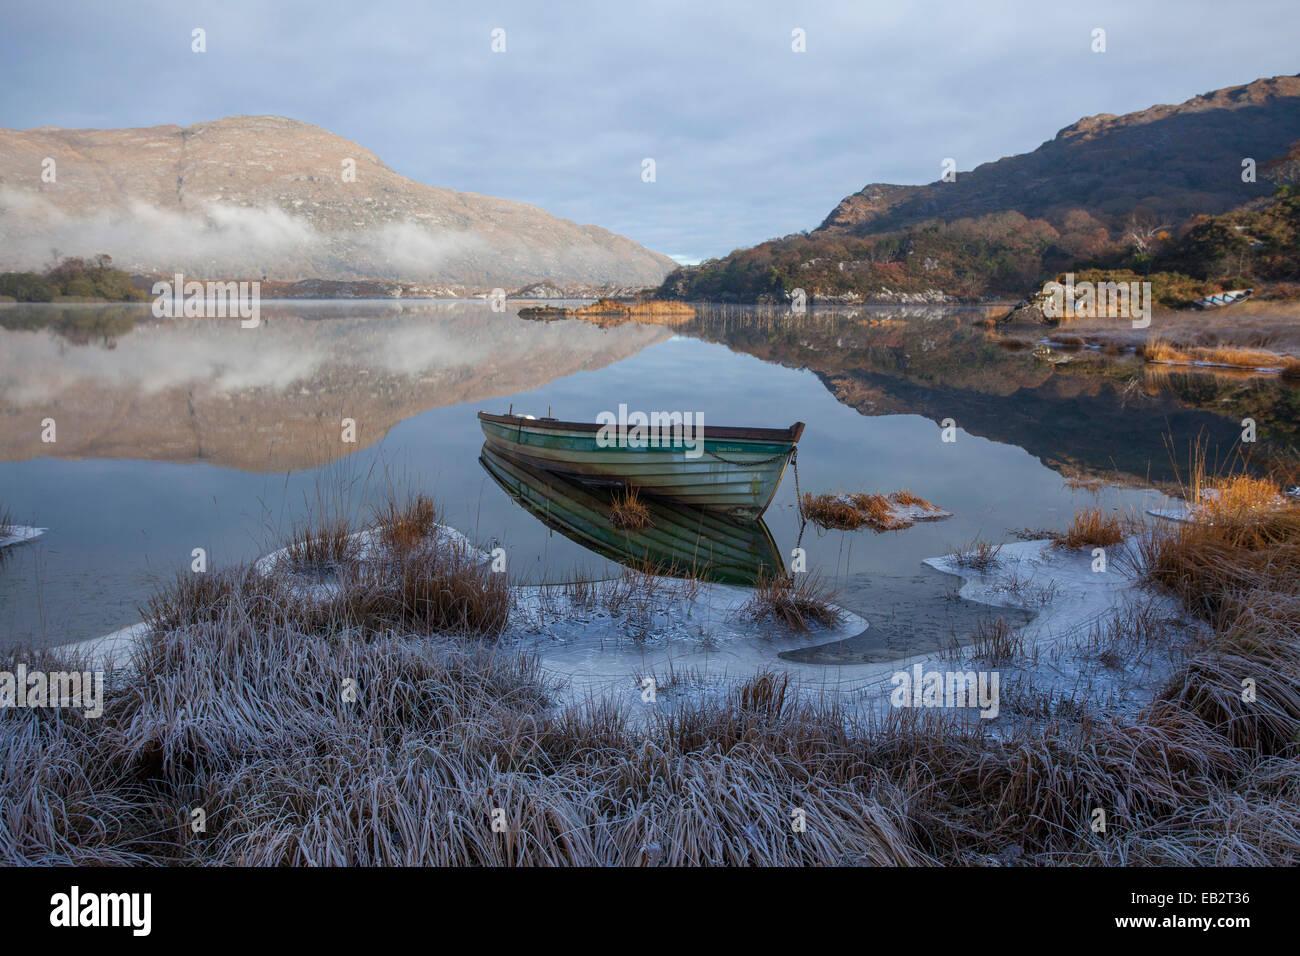 Frosty fishing boat on the shore of Upper Lake, Killarney National Park, County Kerry, Ireland. - Stock Image